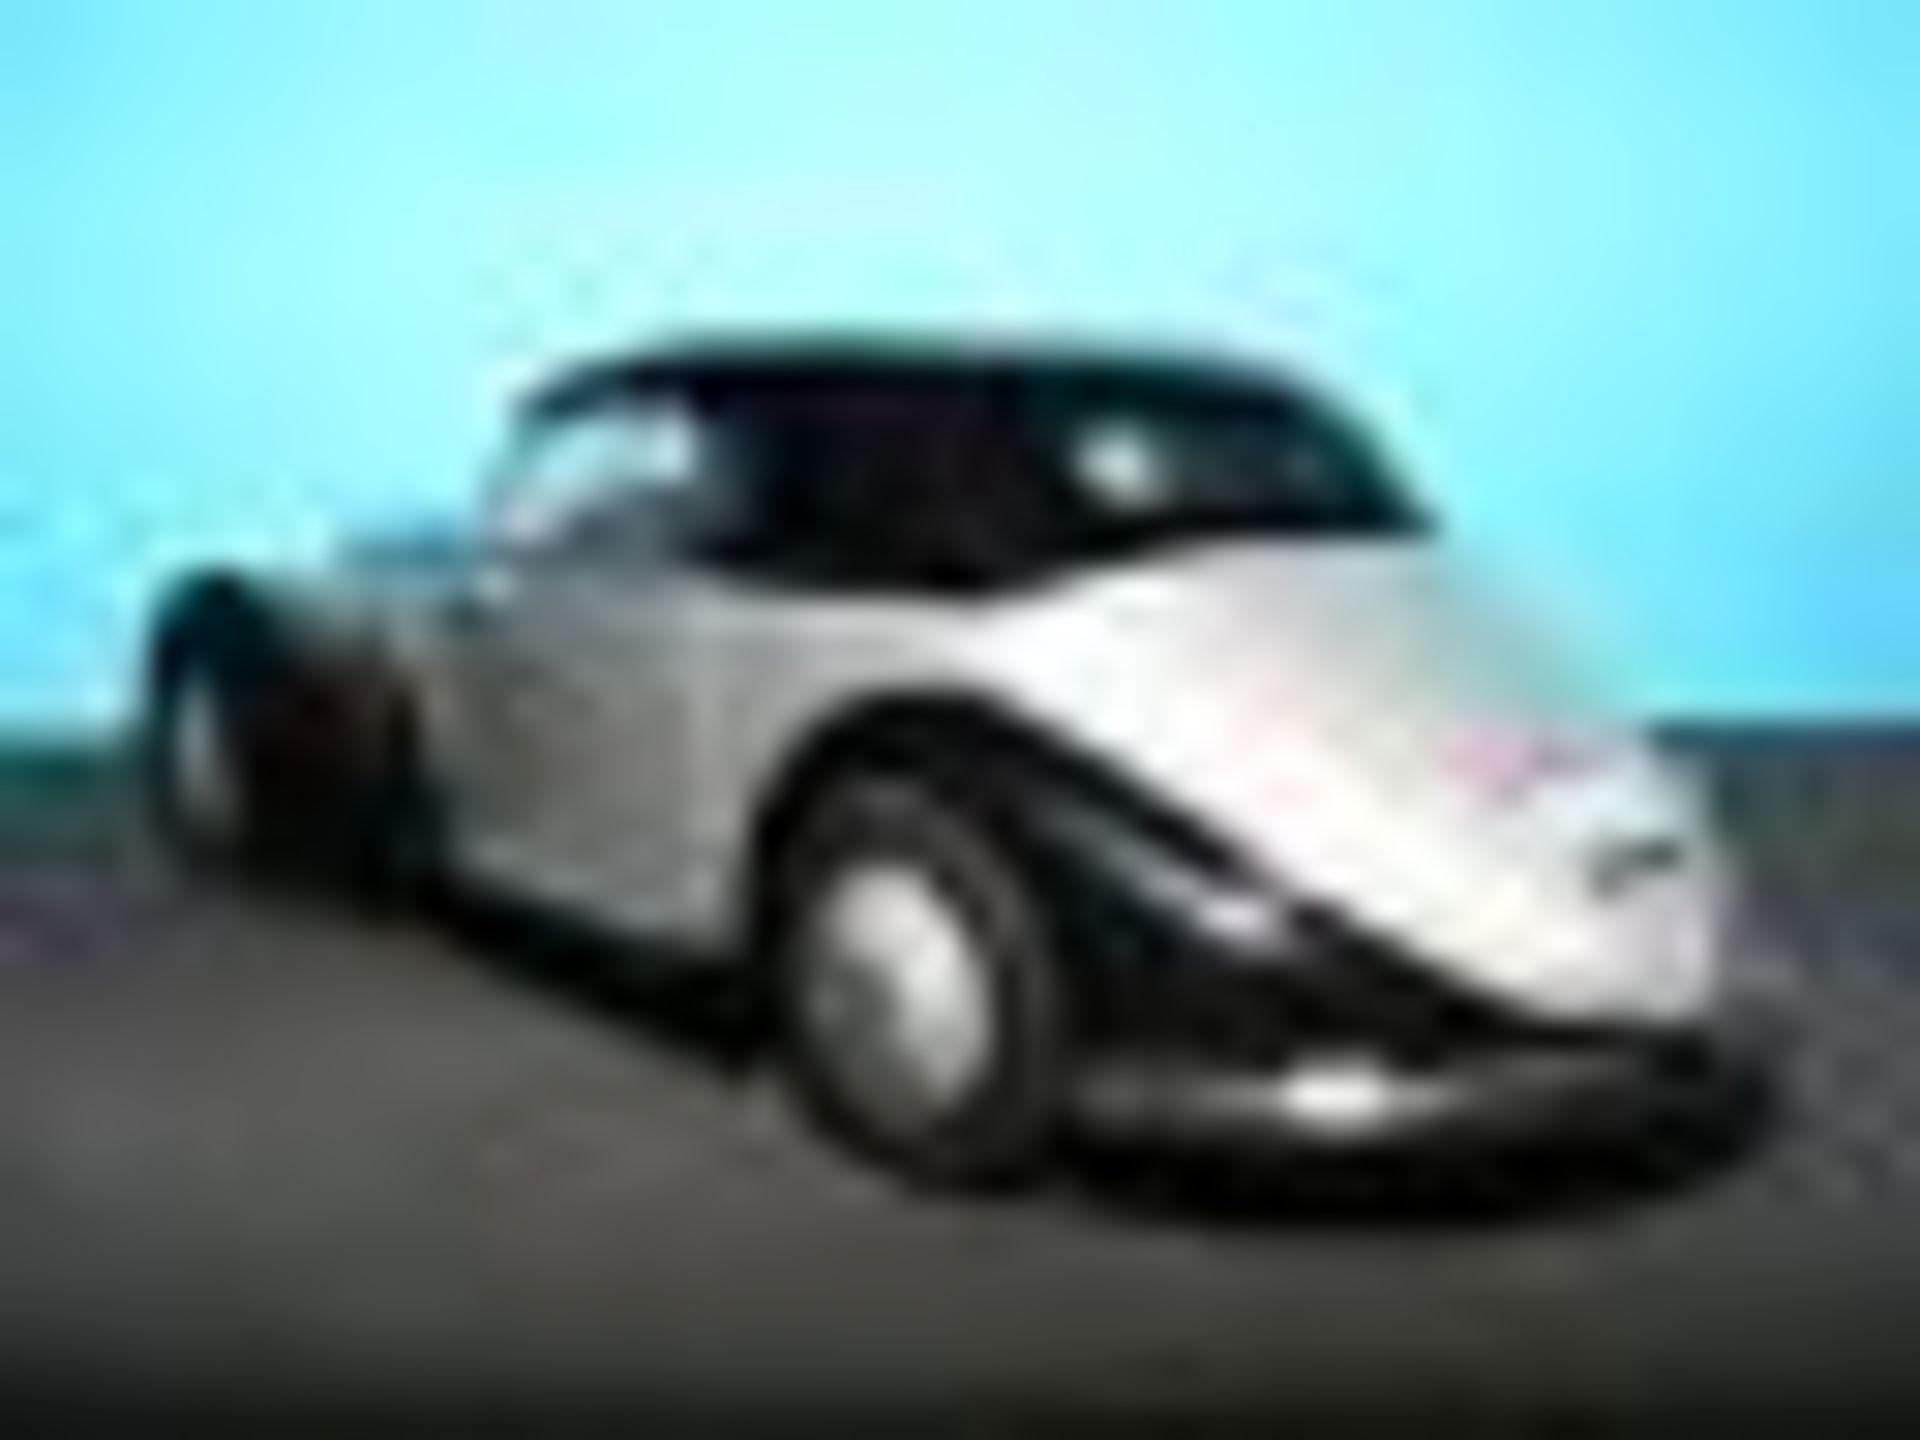 Lot 10357 - V Brand New 1/43 Diecast 1934 Lancia Astura Coupe Gran Lusso - eBay Price £19.99